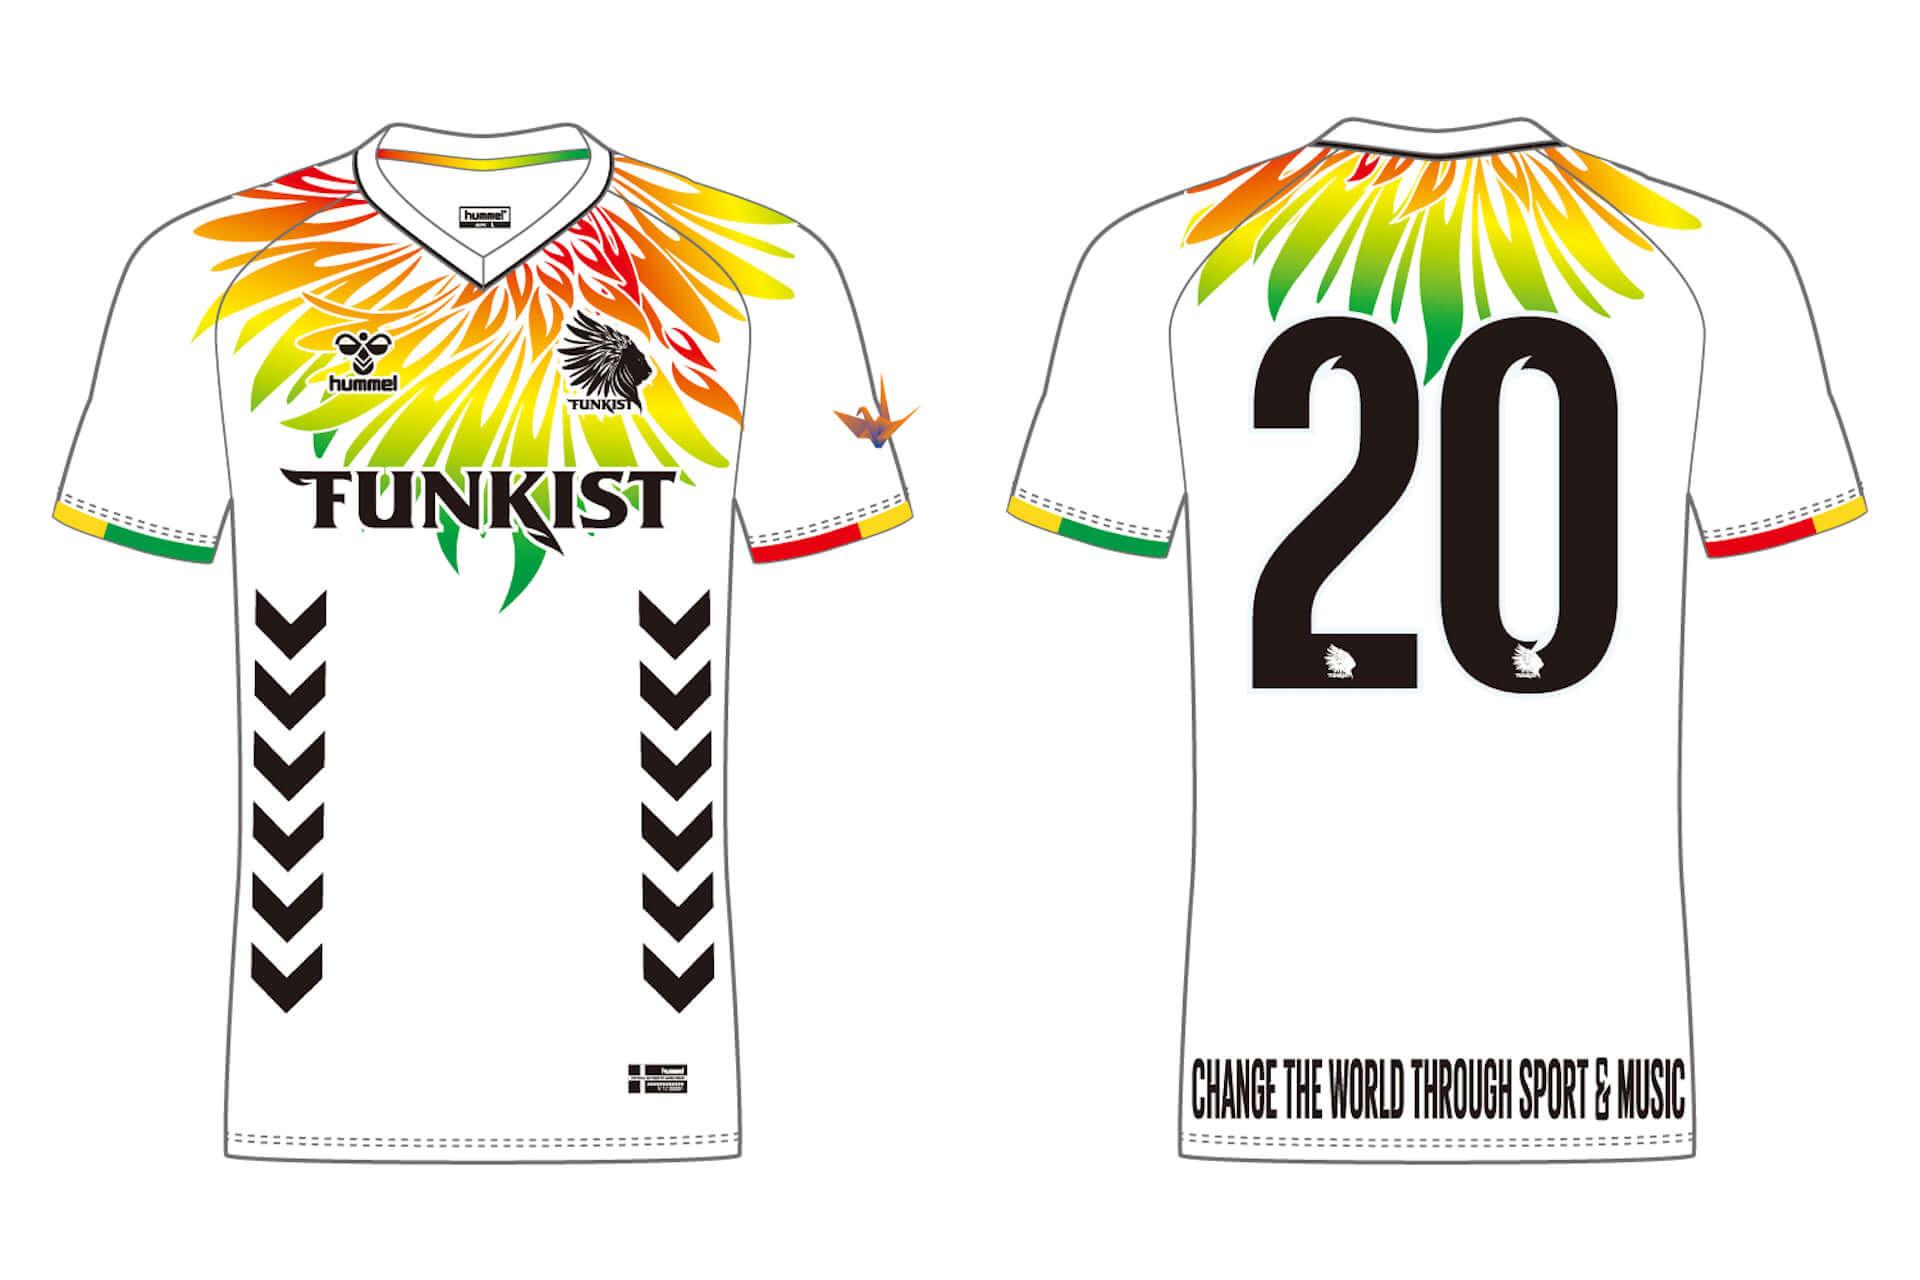 FUNKISTの20周年記念ユニフォームをヒュンメルがデザイン|売り上げの一部が南アフリカの支援に lifefashion190703funkist-hummel_7-1920x1280